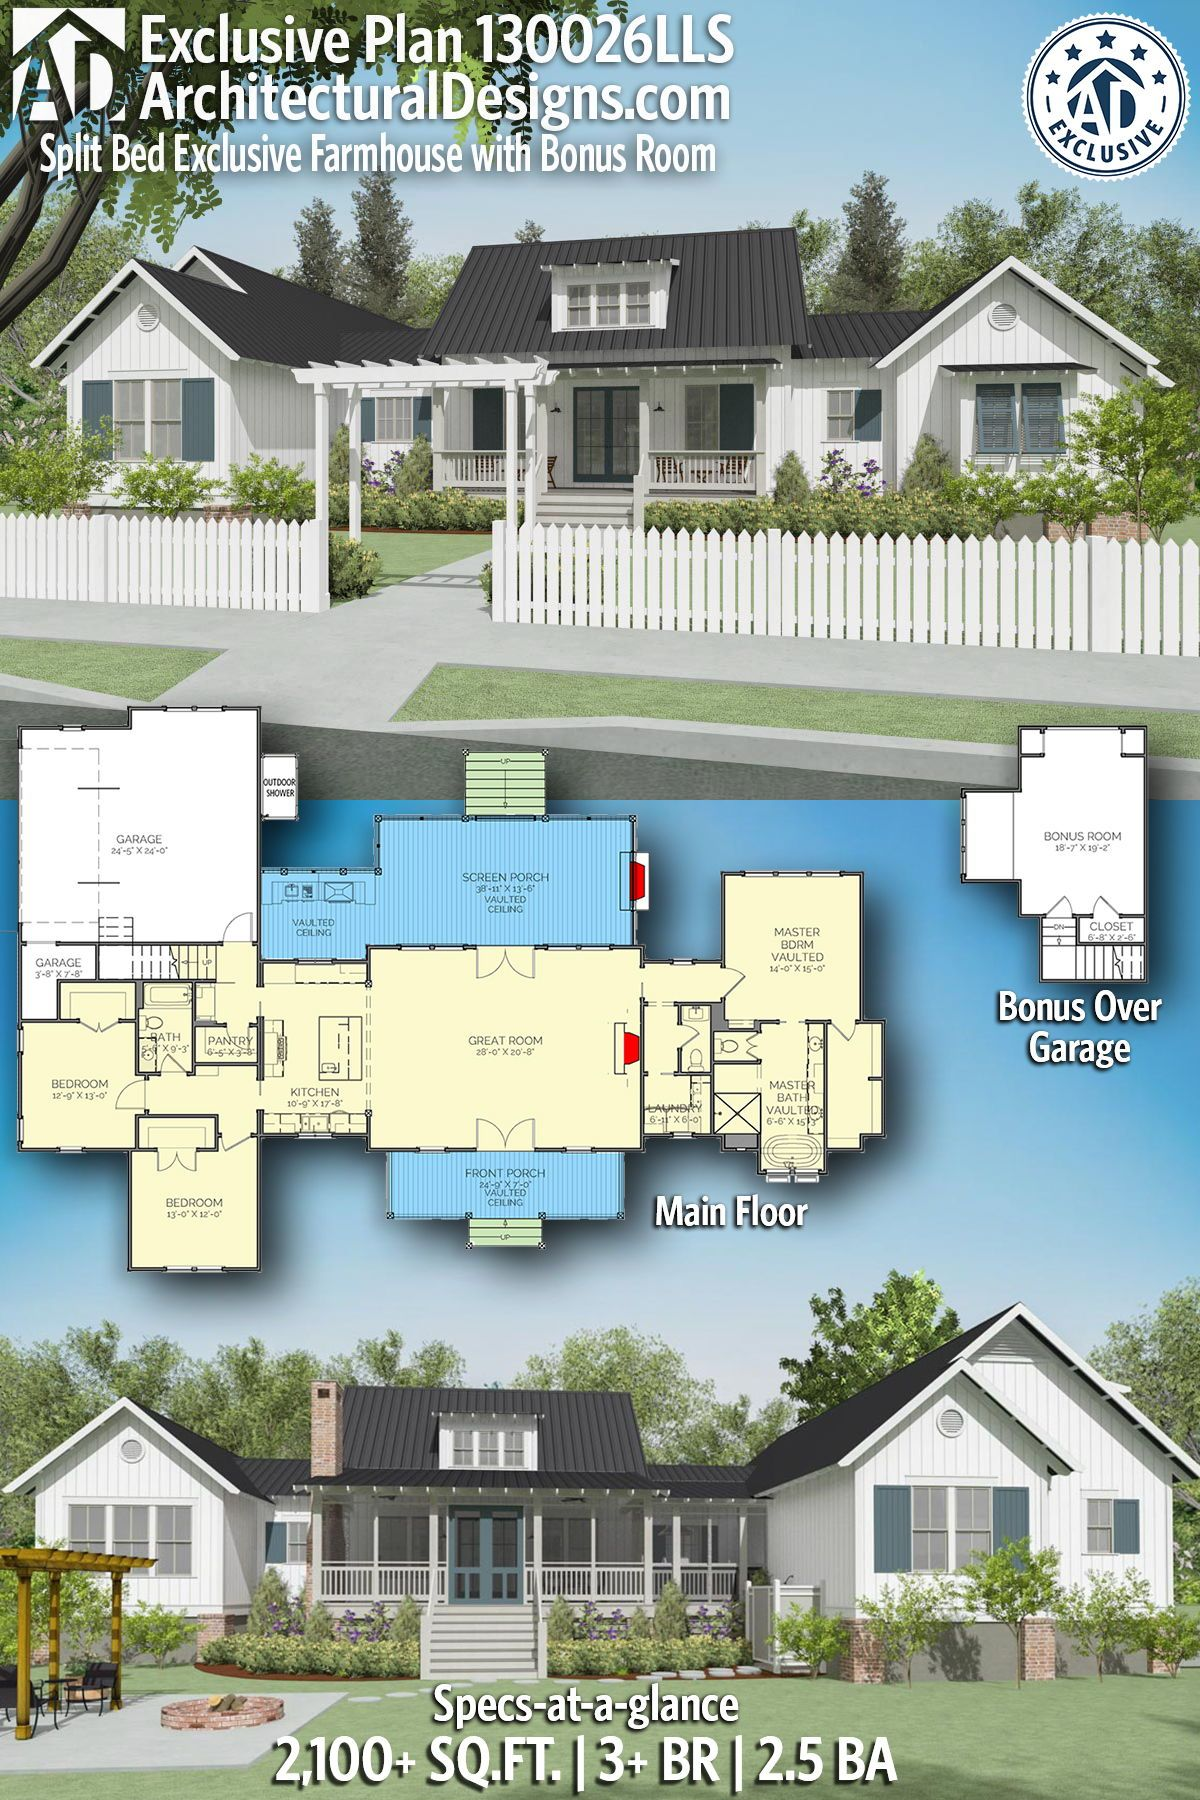 Plan 130026lls Split Bed Exclusive Farmhouse With Bonus